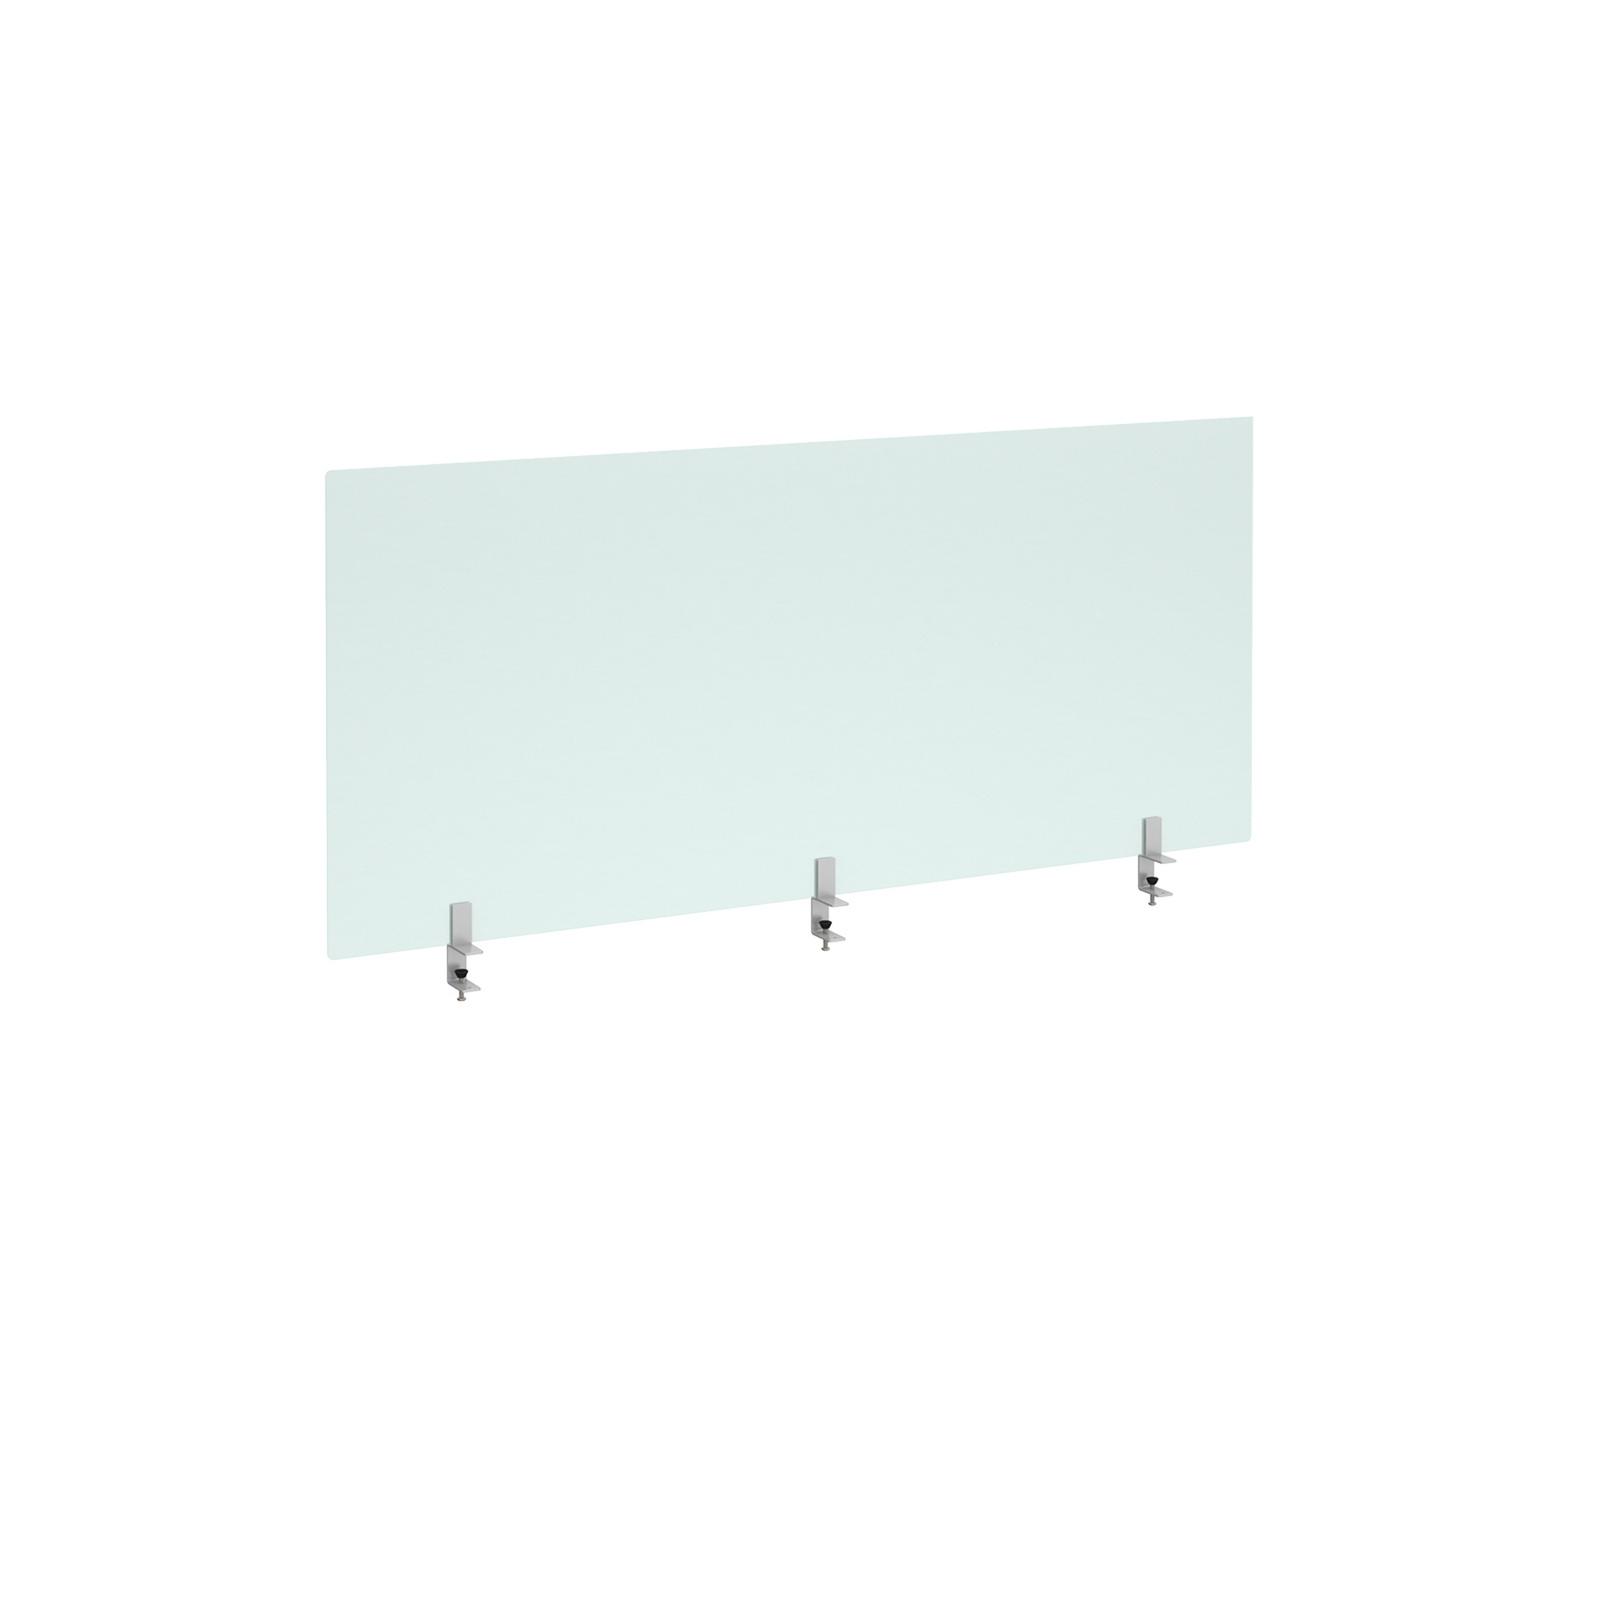 Acrylic Desk Mounted Screen 1600